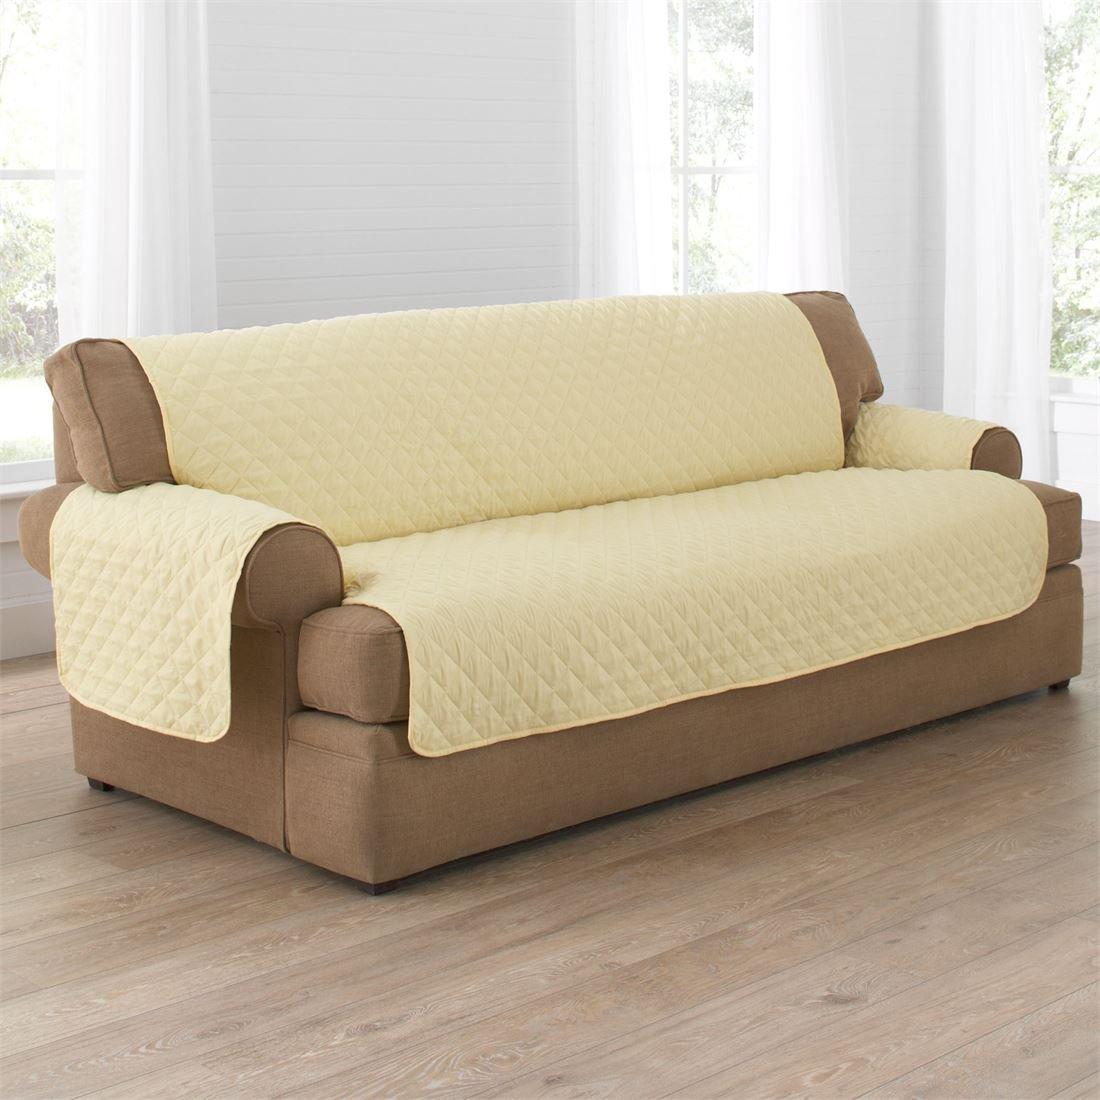 BrylaneHome Bh Studio Water-Repellent Microfiber Extra-Long Sofa Protector (Yellow,0)